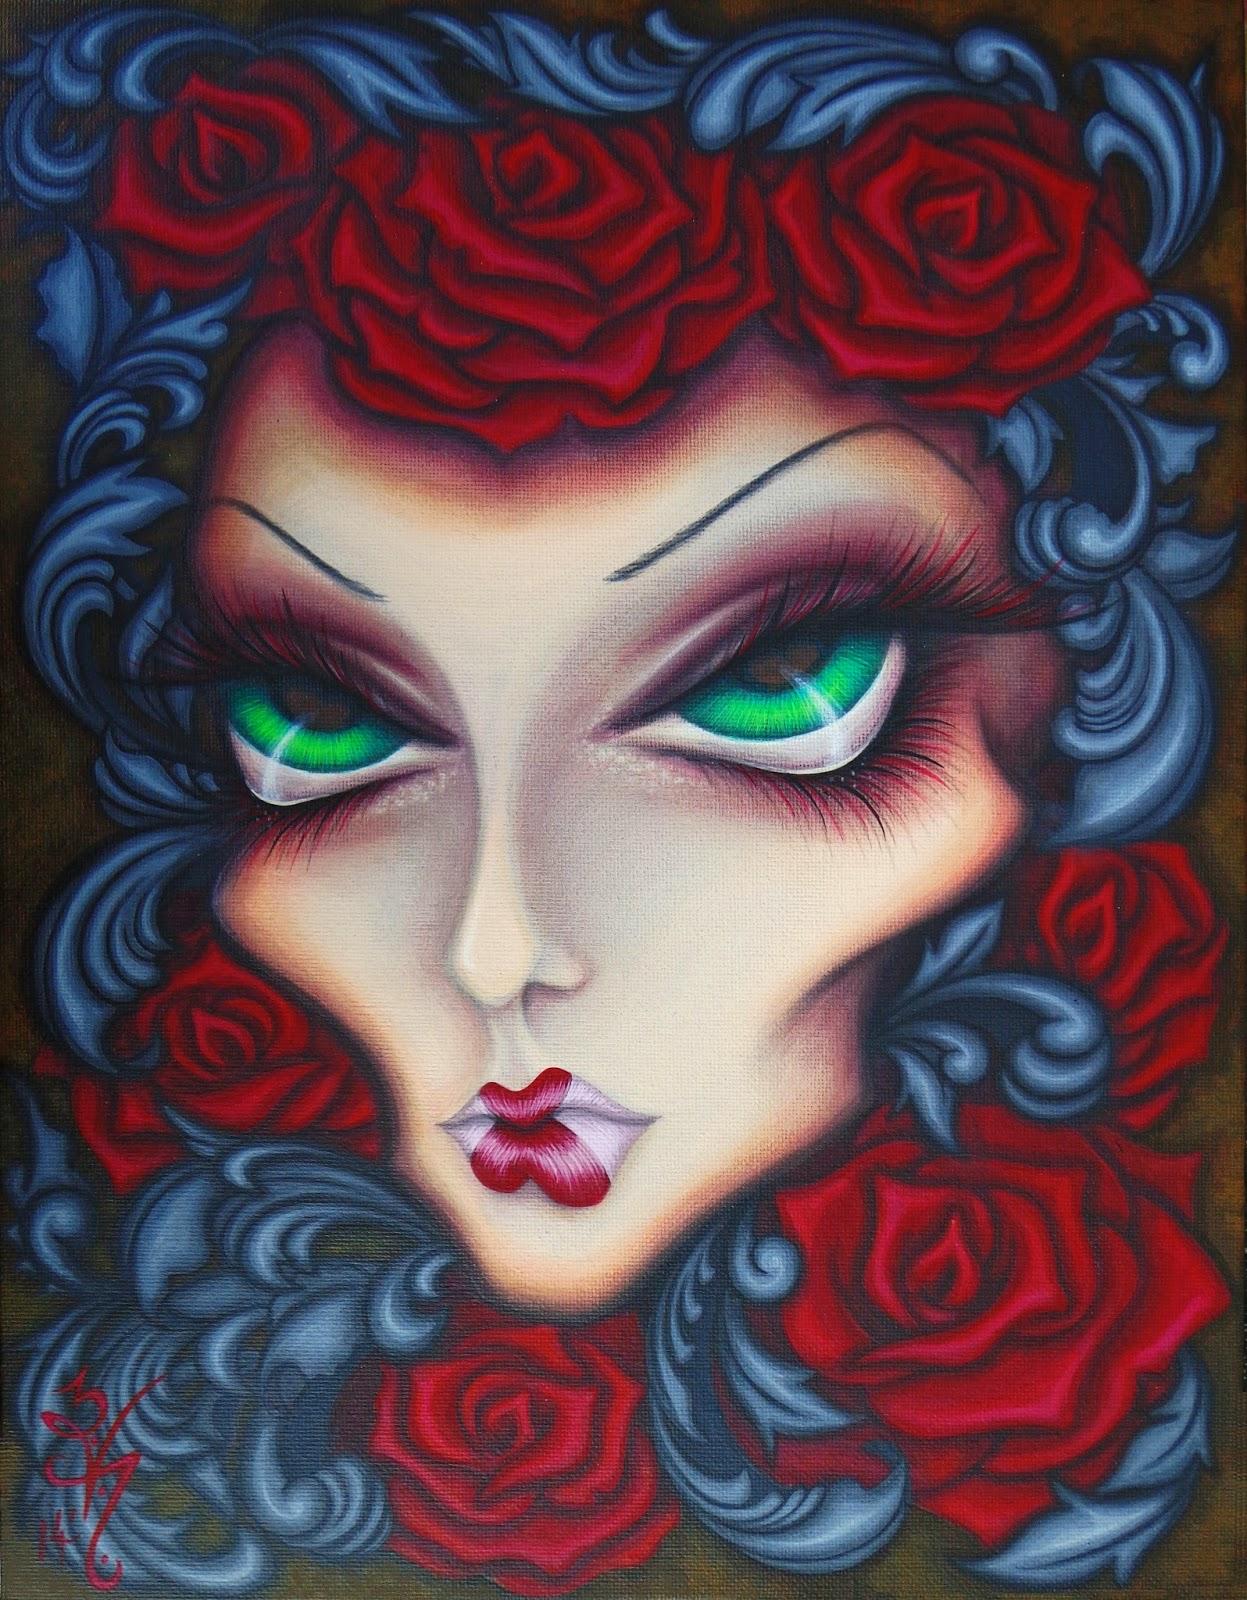 https://www.etsy.com/listing/195209998/original-fantasy-lowbrow-woman-girl-face?ref=shop_home_active_2